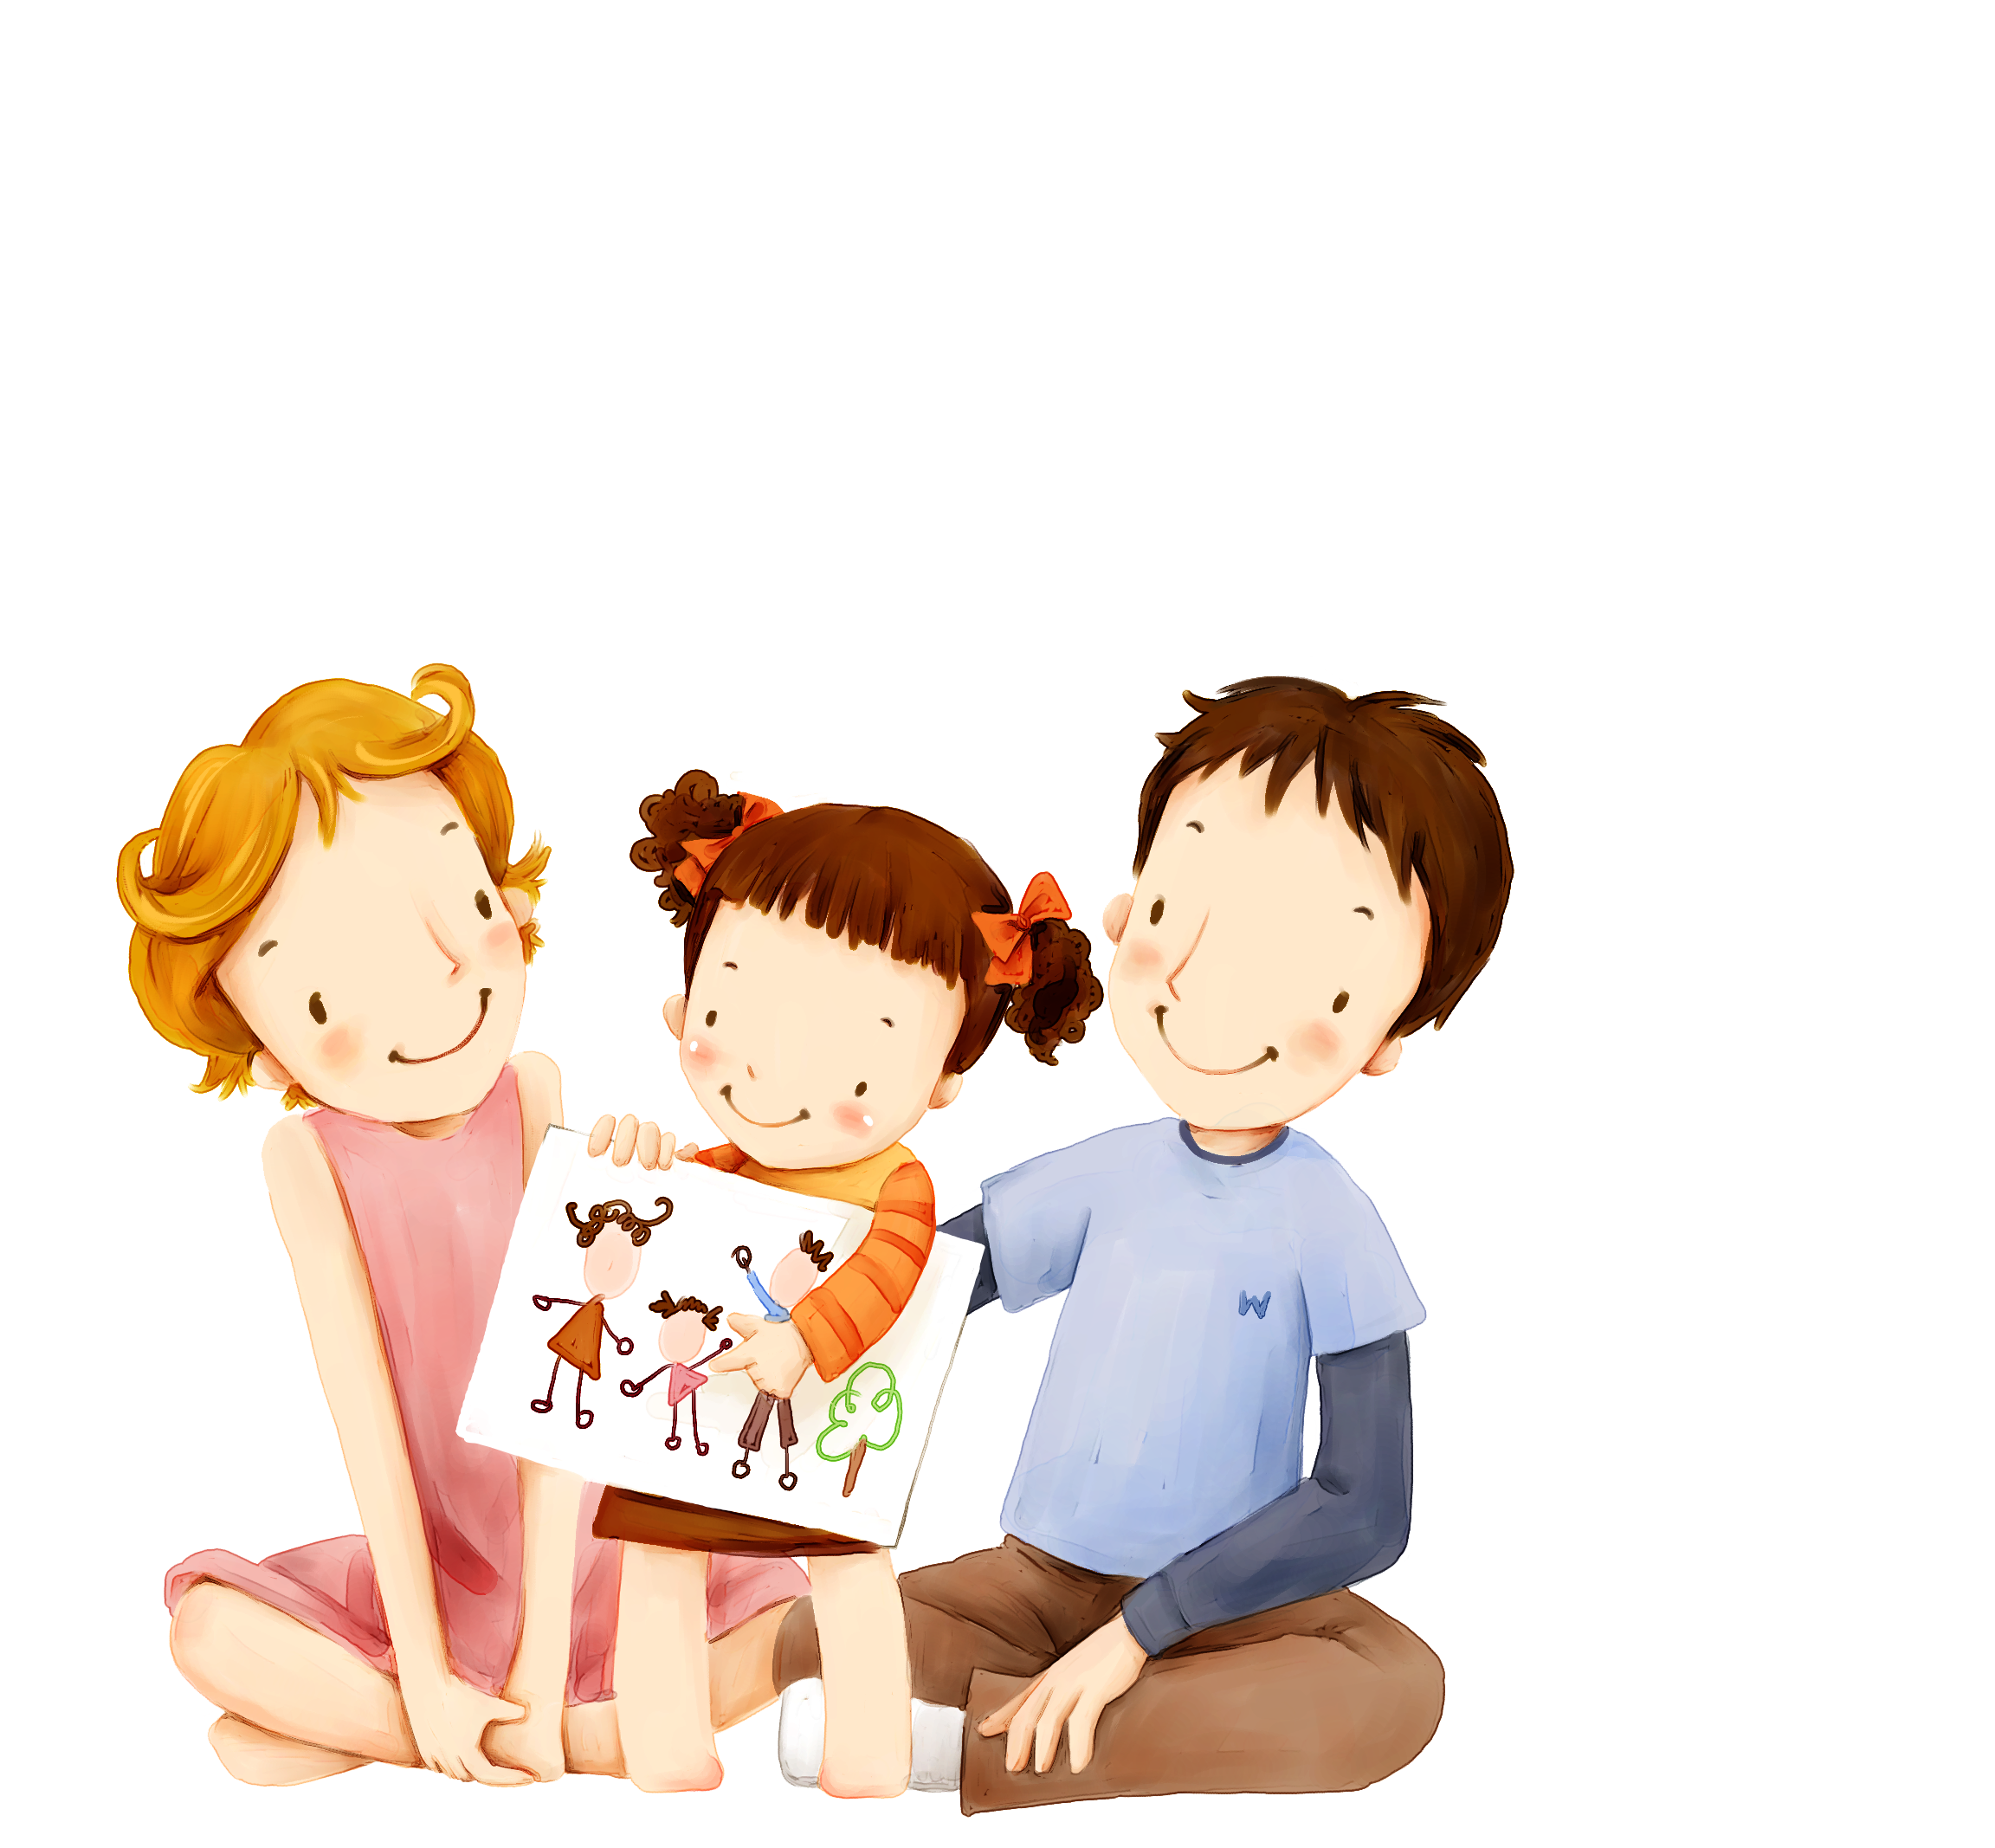 Parent clipart parent love, Parent parent love Transparent ...